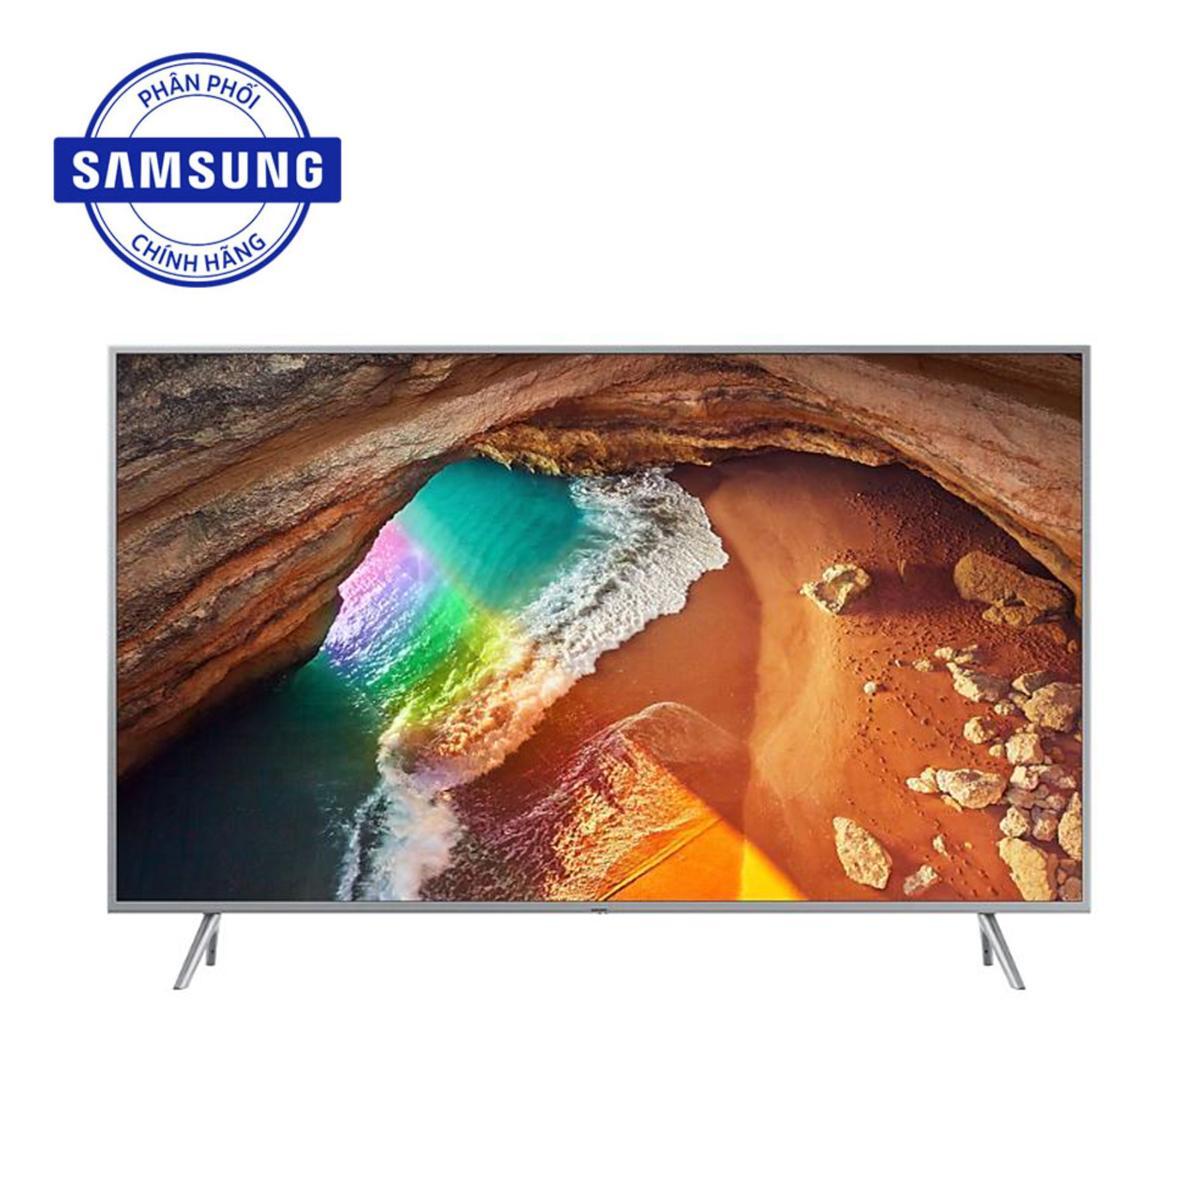 Smart TV 4K QLED 55 inch Q65R 2019